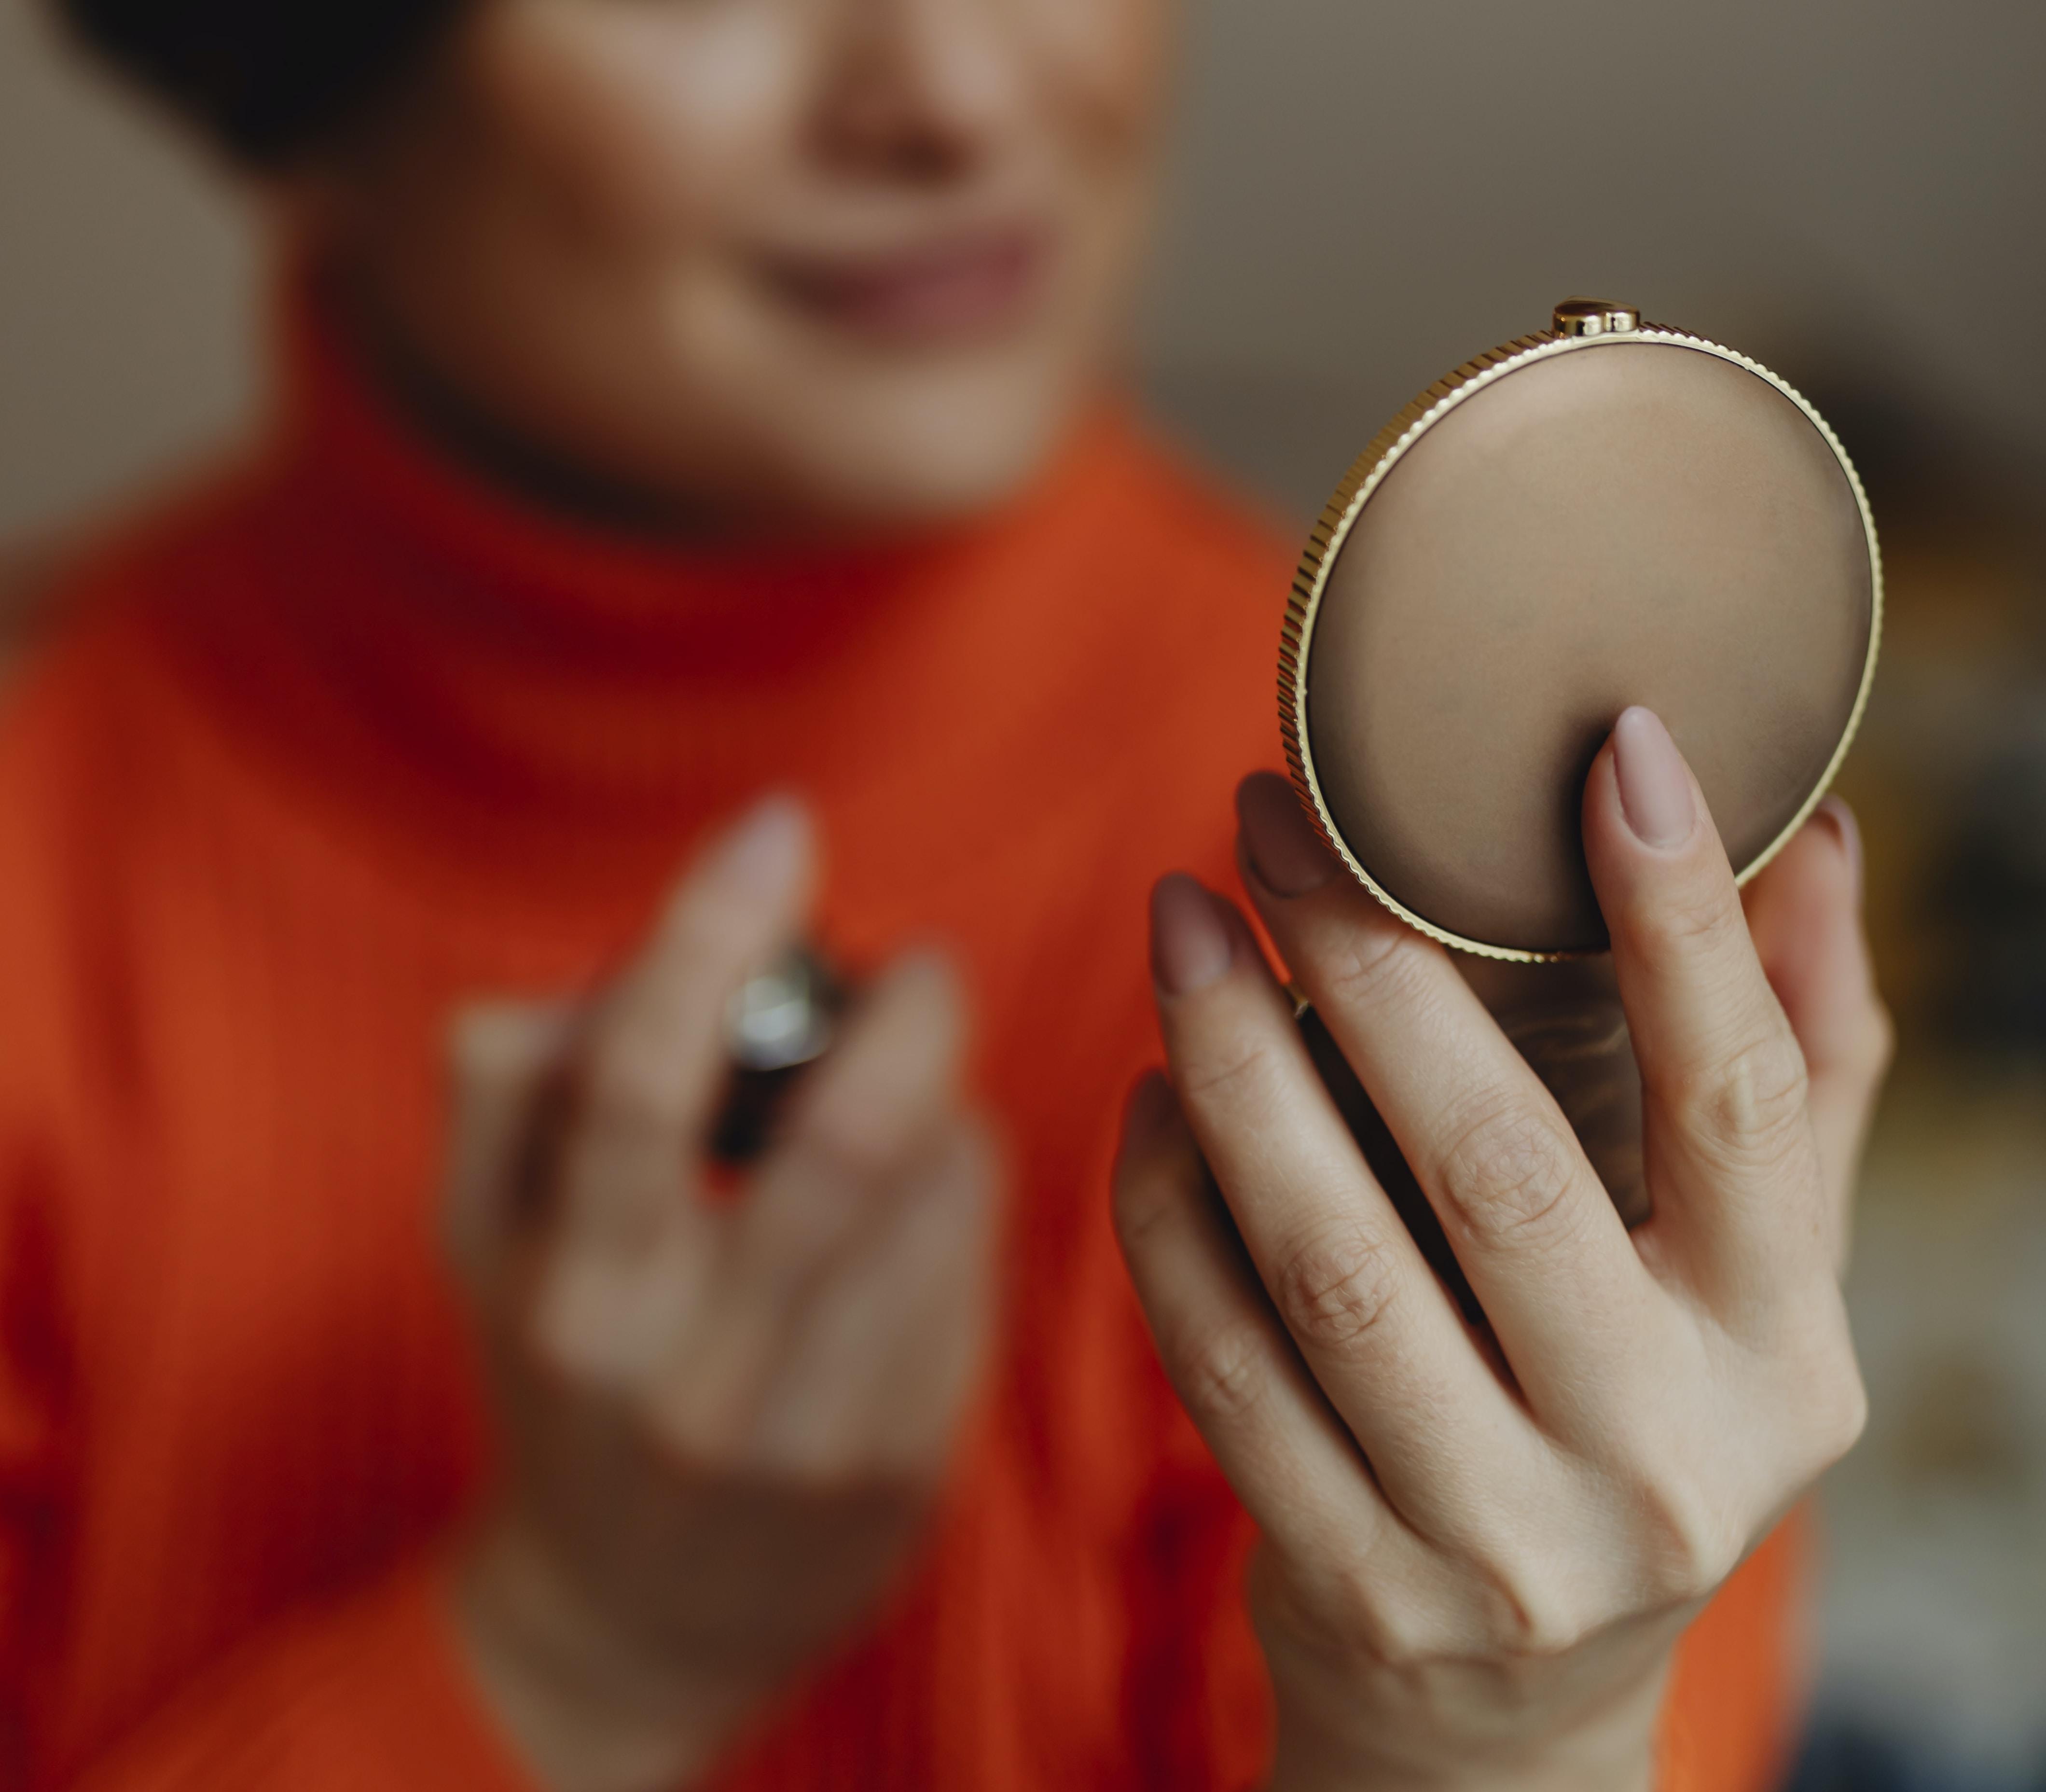 tilt shift focus photography of woman holding handheld mirror